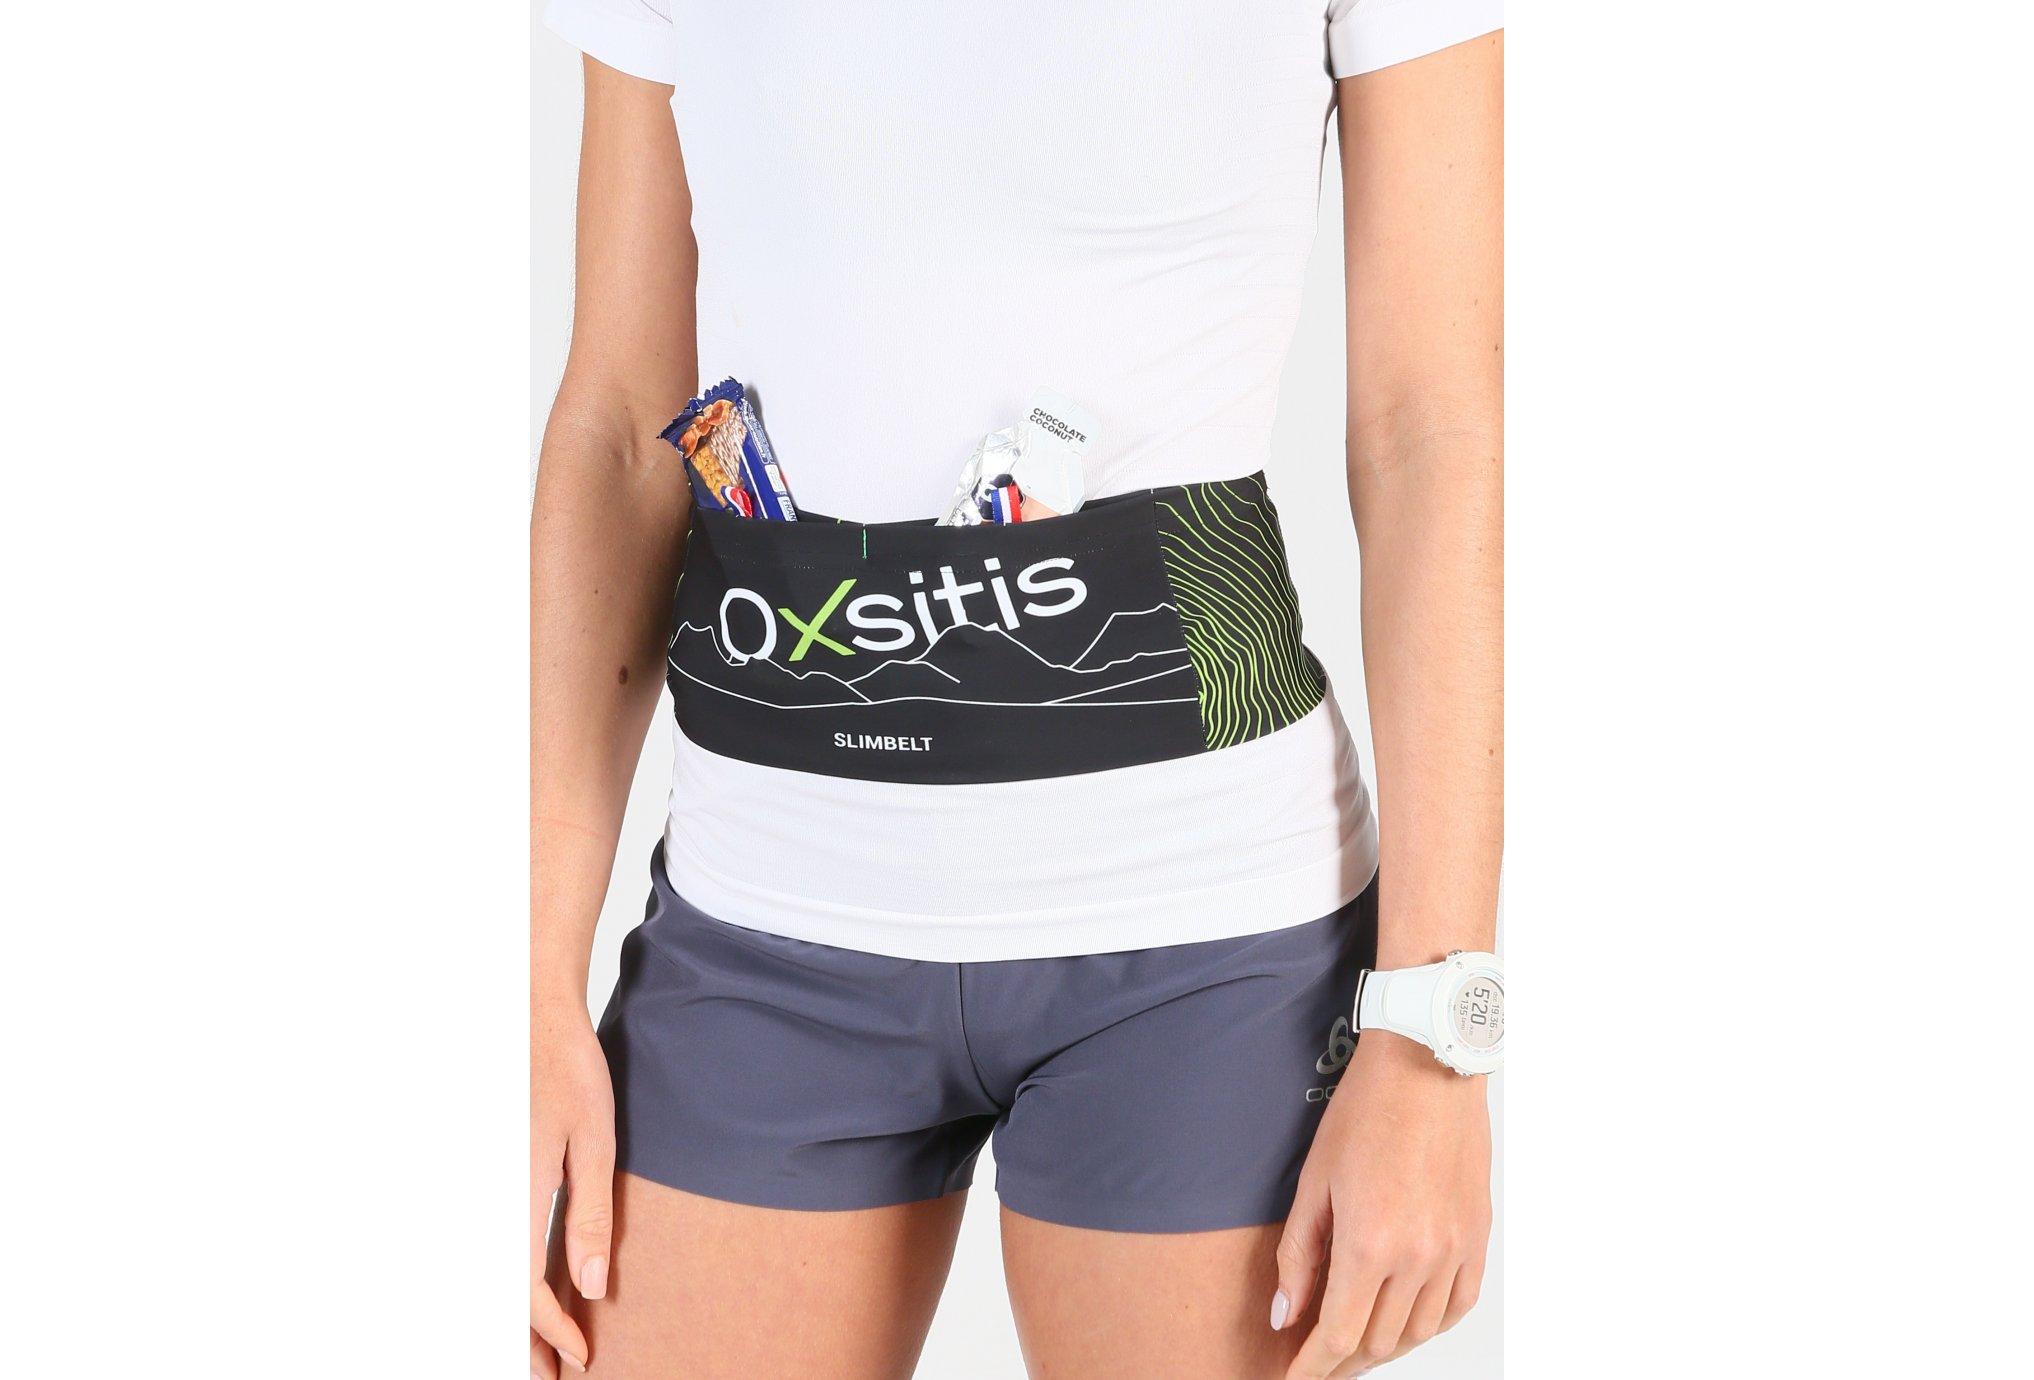 Oxsitis Slimbelt Ceinture / porte dossard